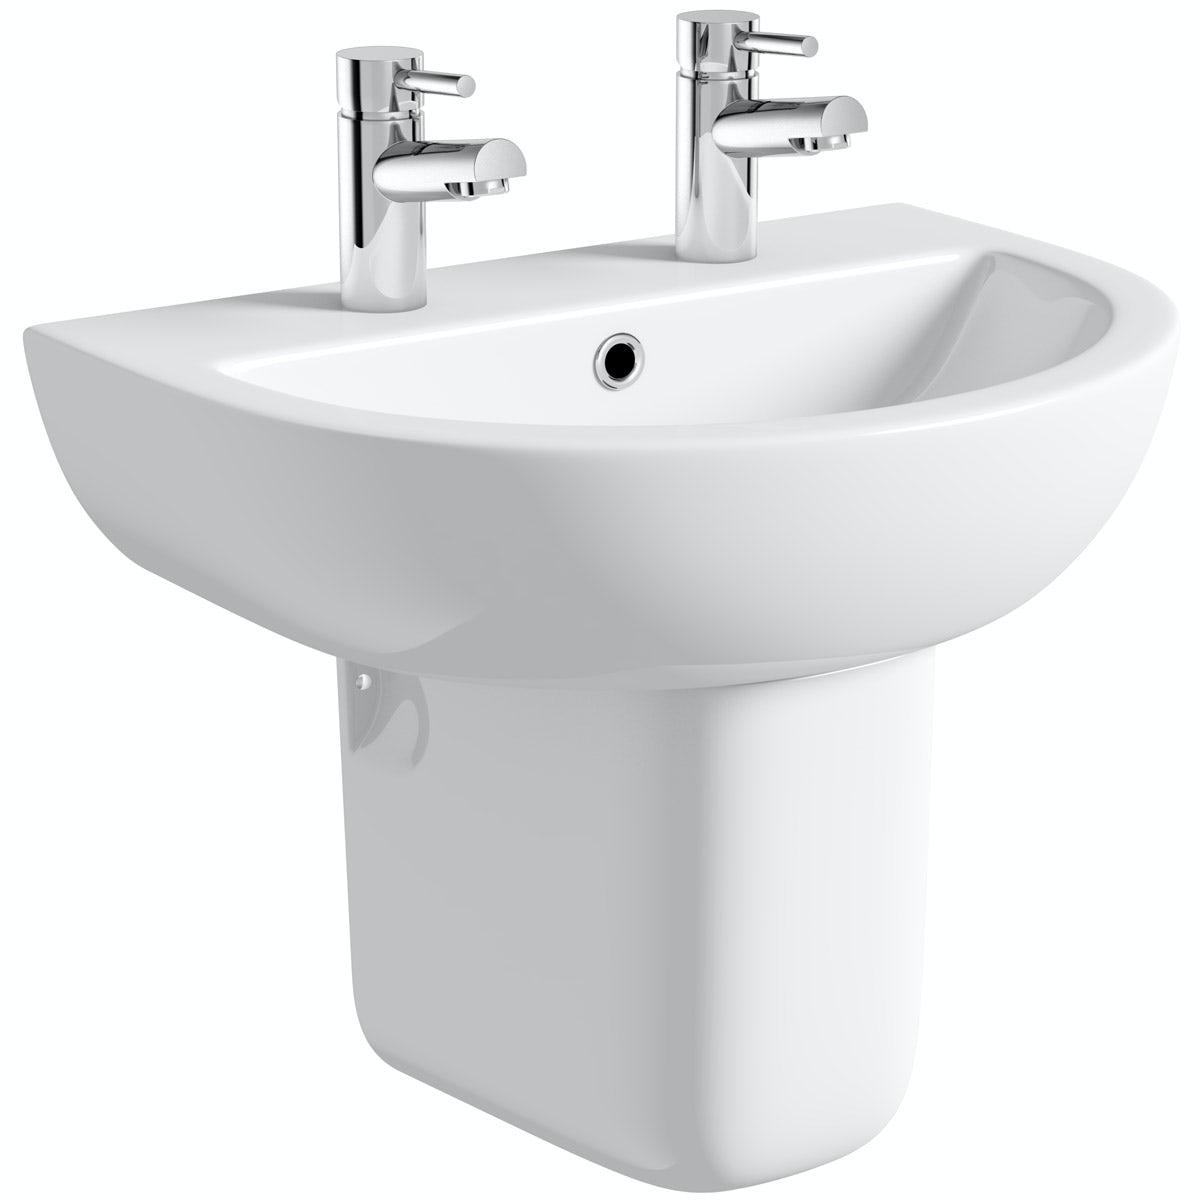 Orchard Elena 2 tap hole semi pedestal basin 450mm